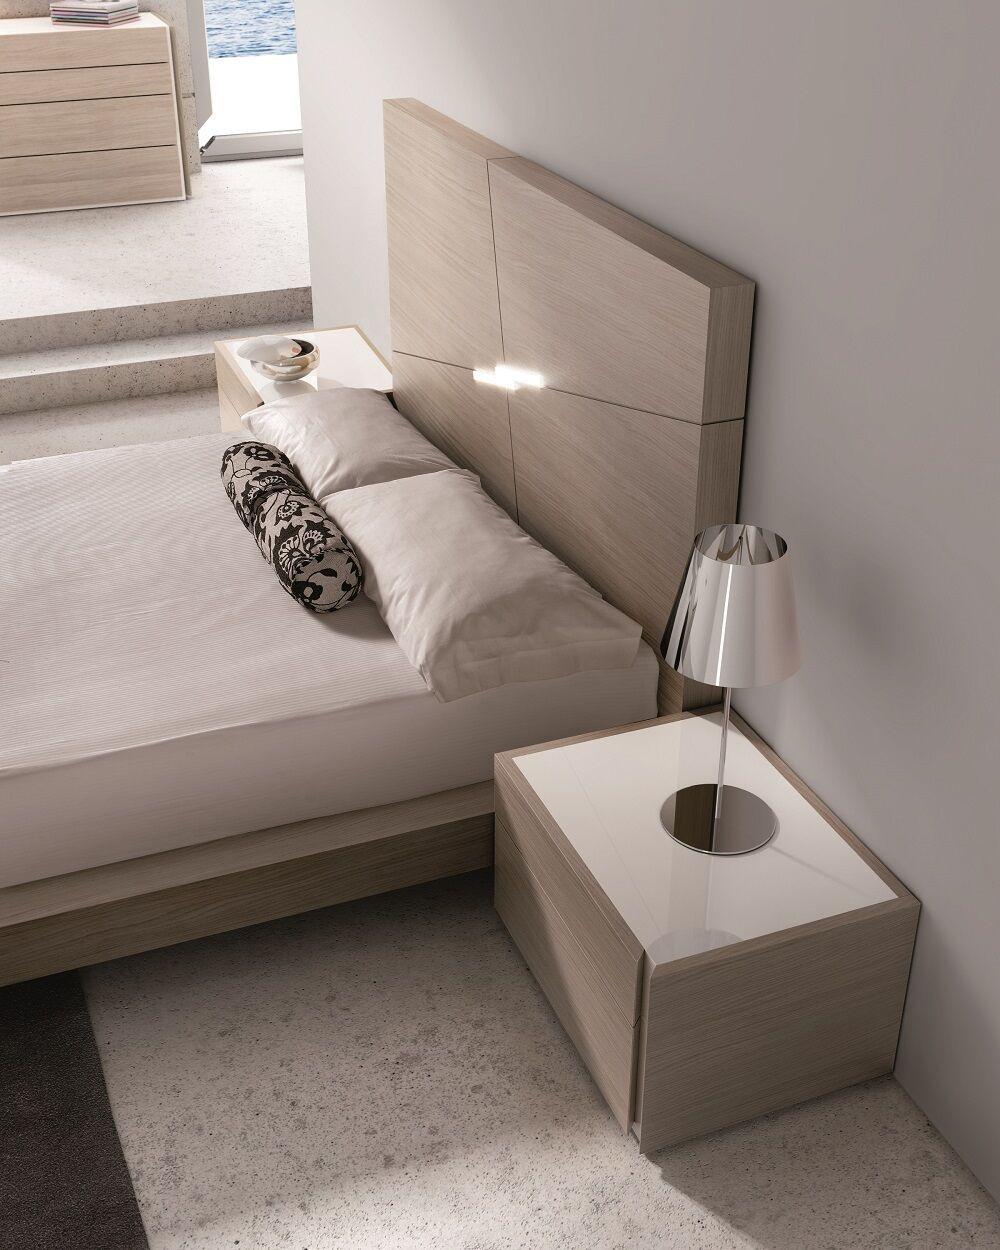 Evora Queen Size Bed 18145 J&M Modern Beds In 2020